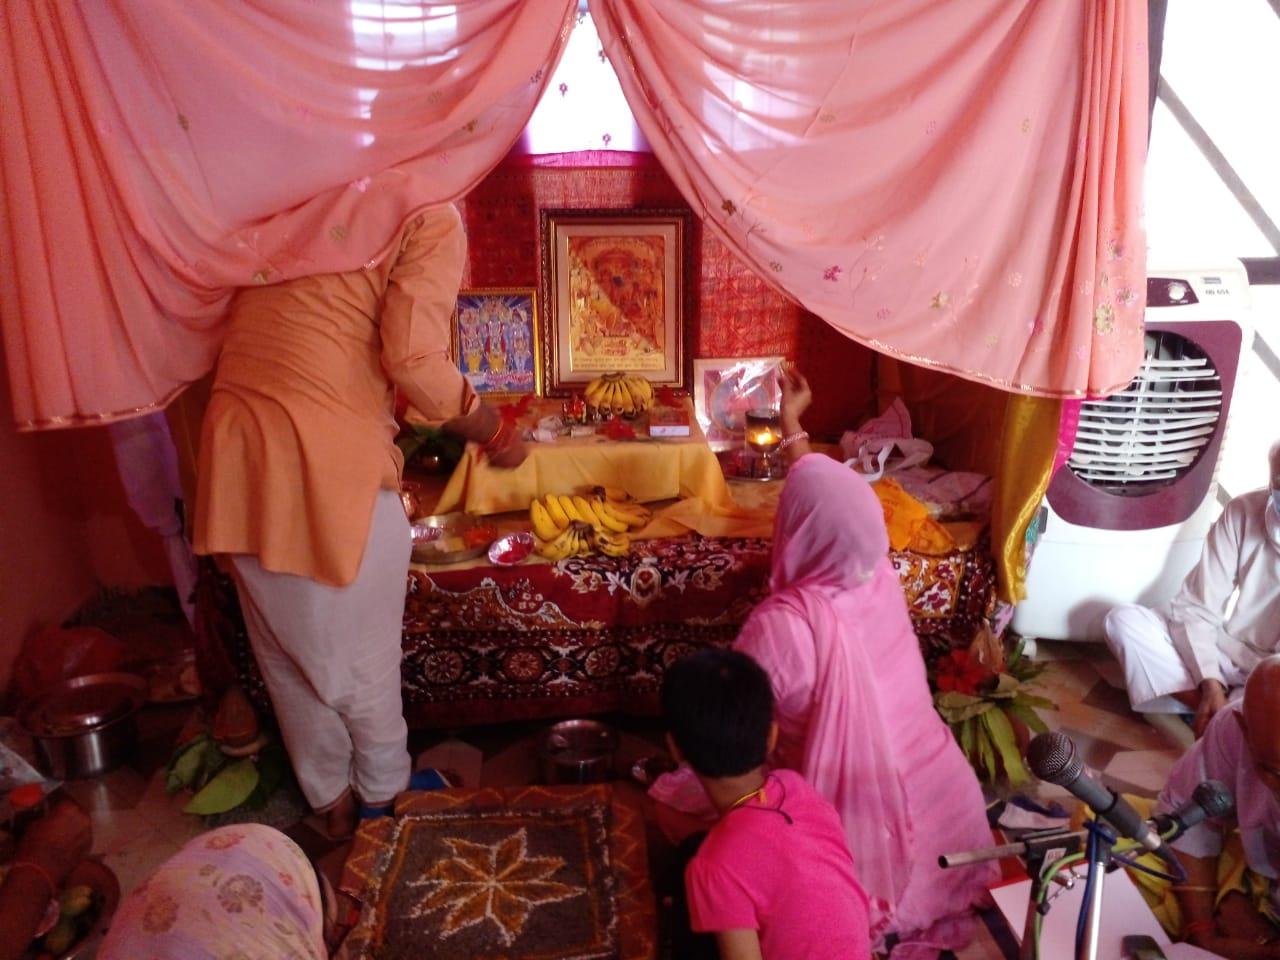 कोरोना की तीसरी लहर रोकने को ब्राह्मण महासभा ने कराया अखंड रामायण का पाठ